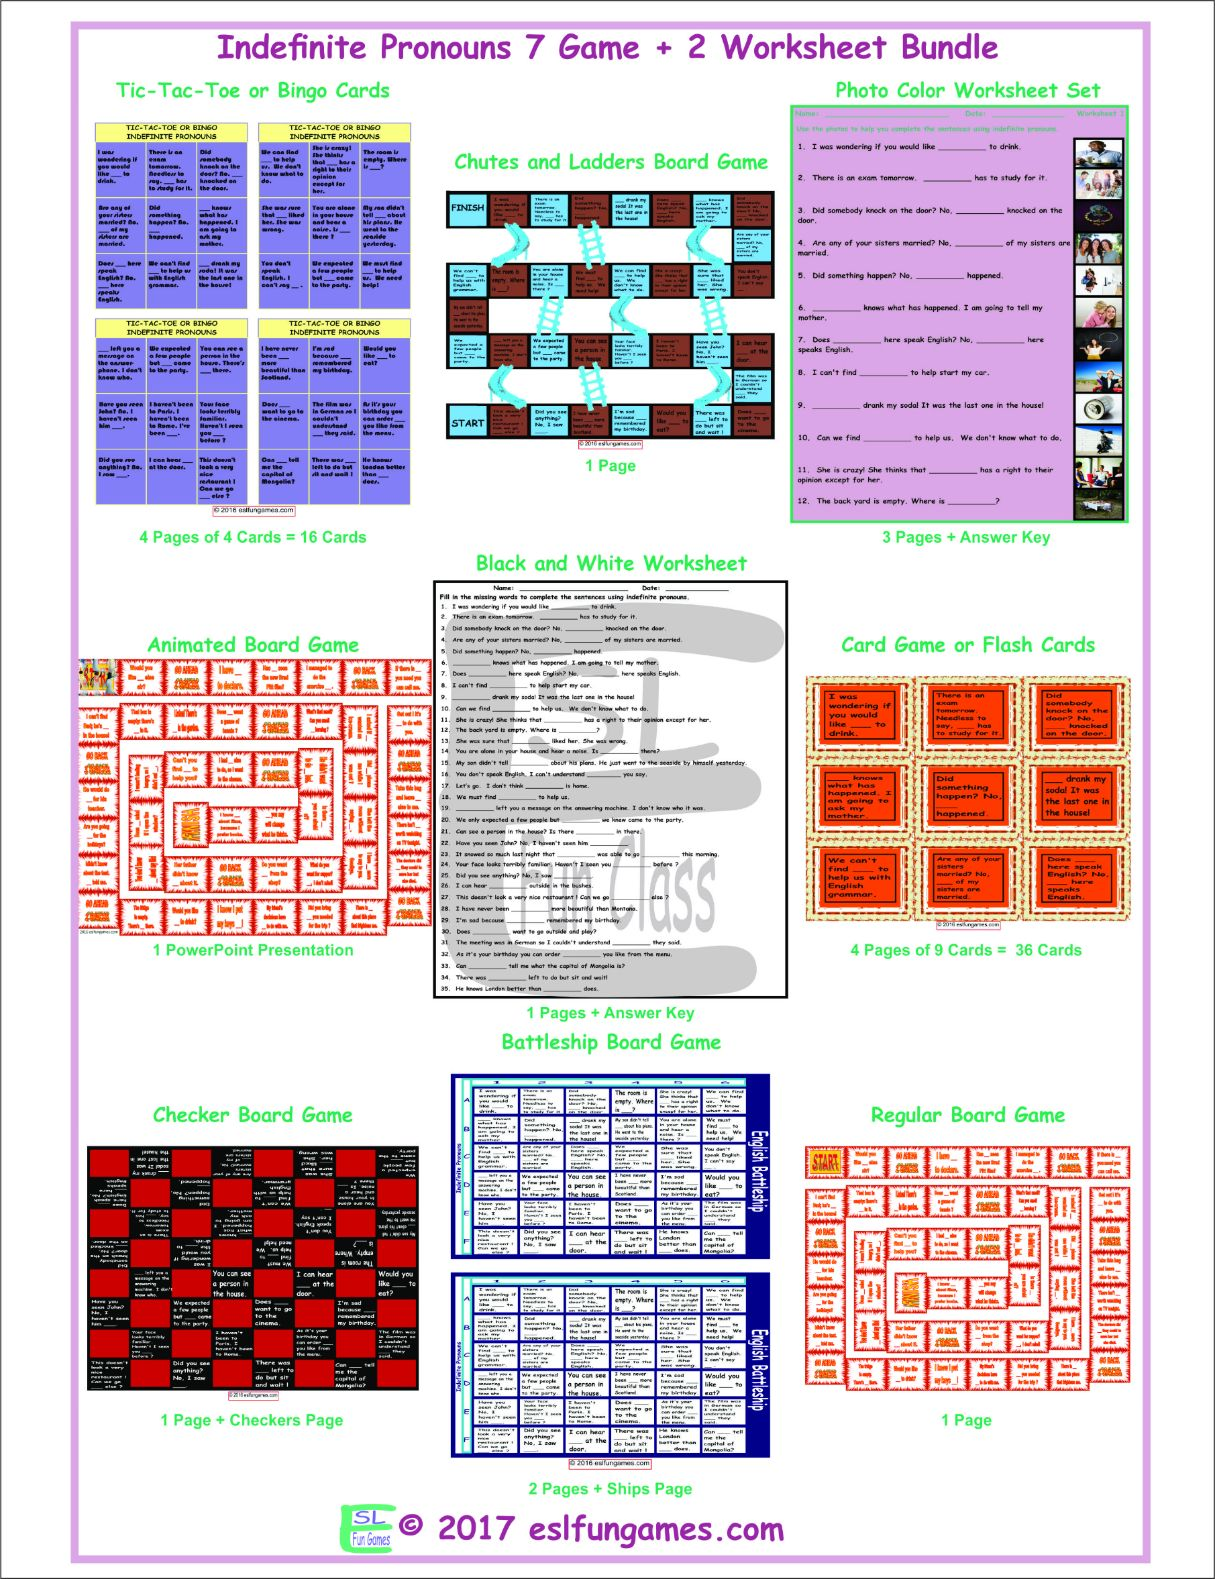 Indefinite Pronouns 7 Game Plus 2 Worksheet Bundle By Eslfungames